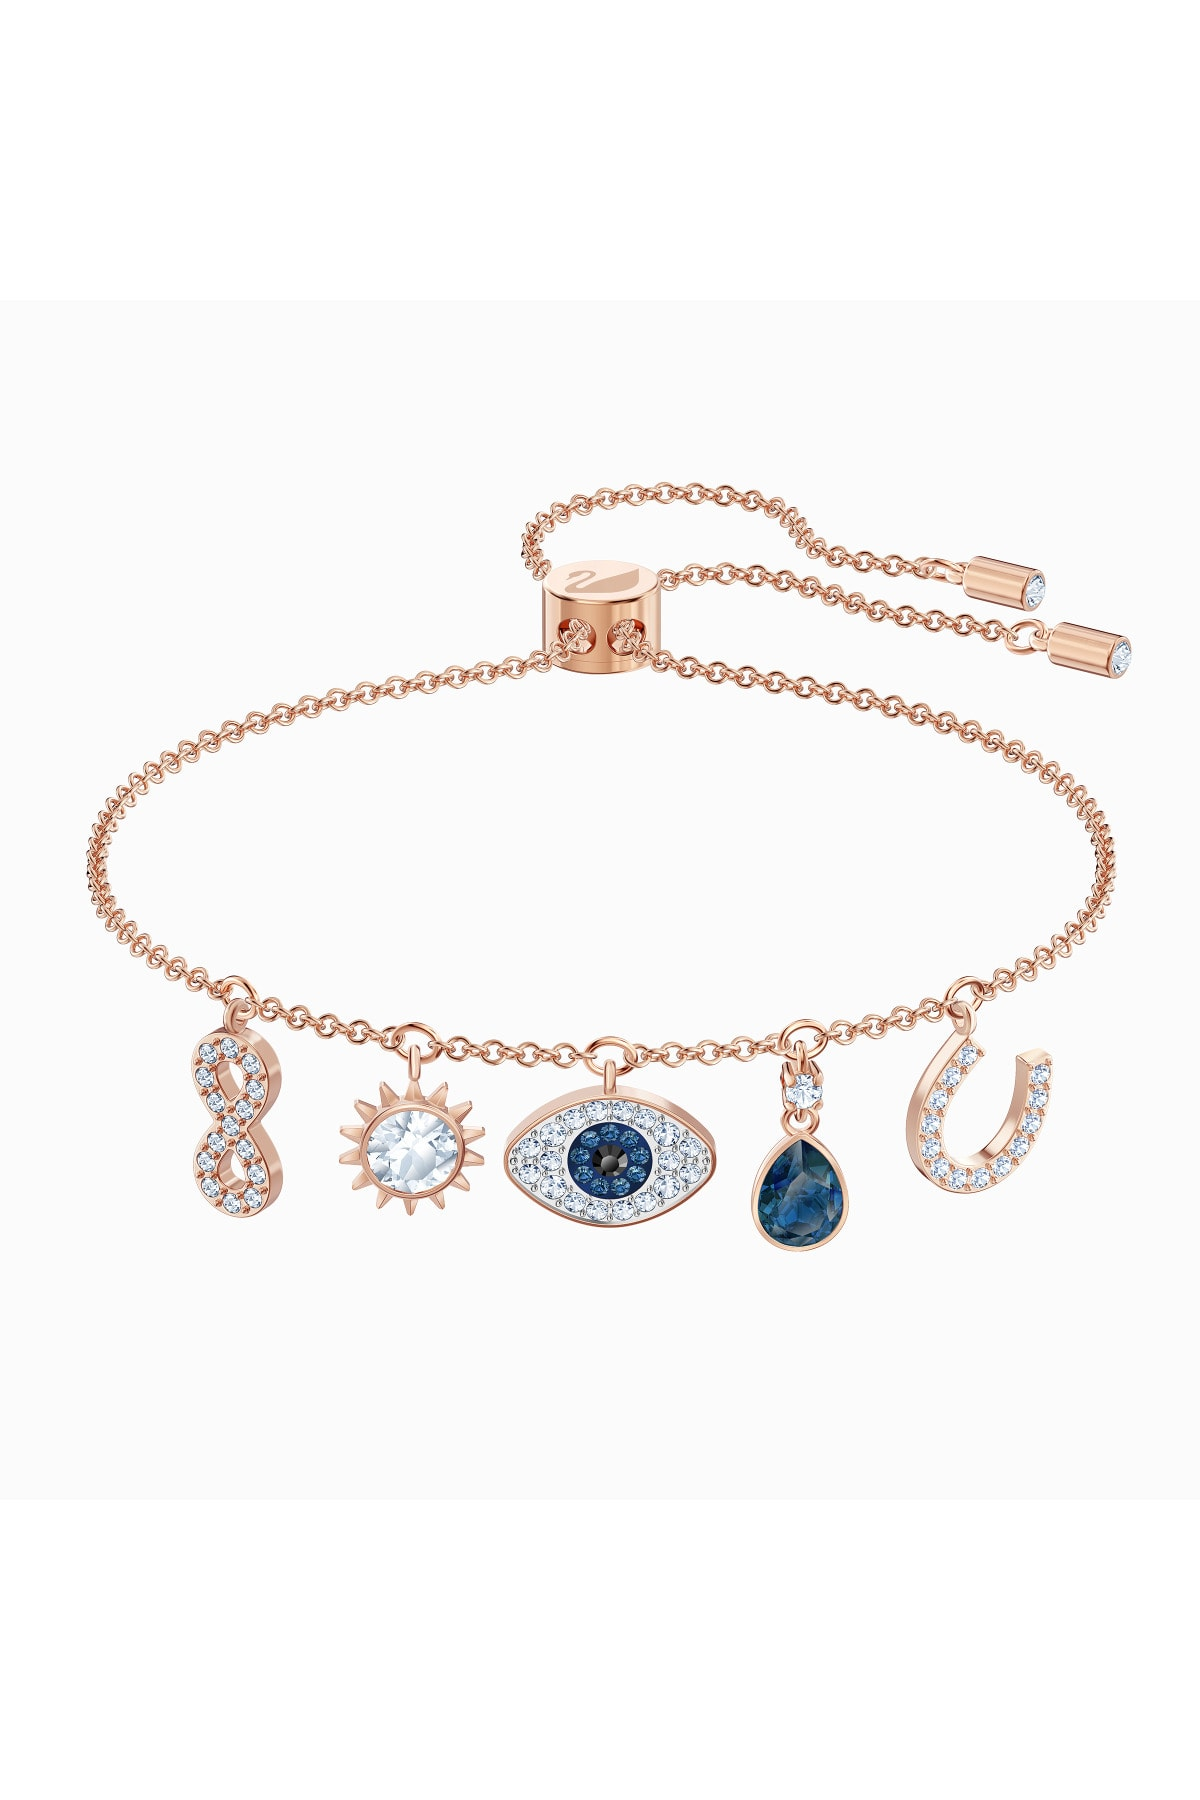 Swarovski 5497668 Bilezik Swa Symbol:bracelet Charms Lmul/ros M 5497668 1